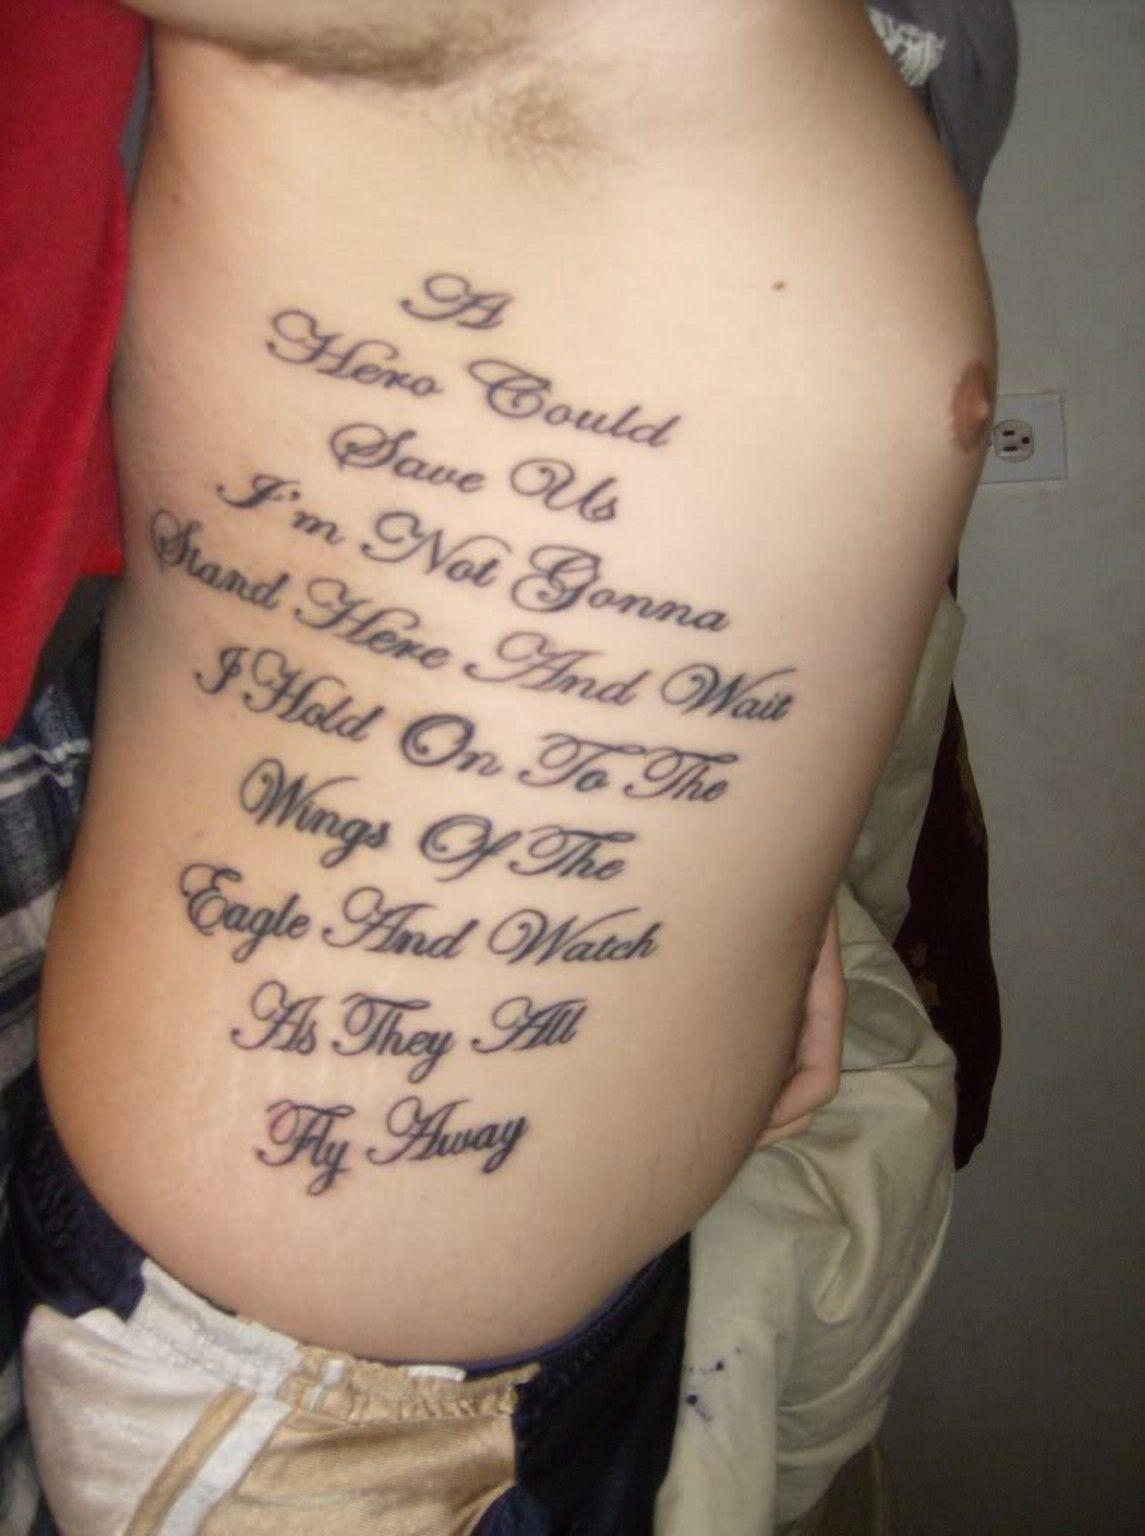 rib tattoos #tattoosdesigns - more designs at stylendesigns